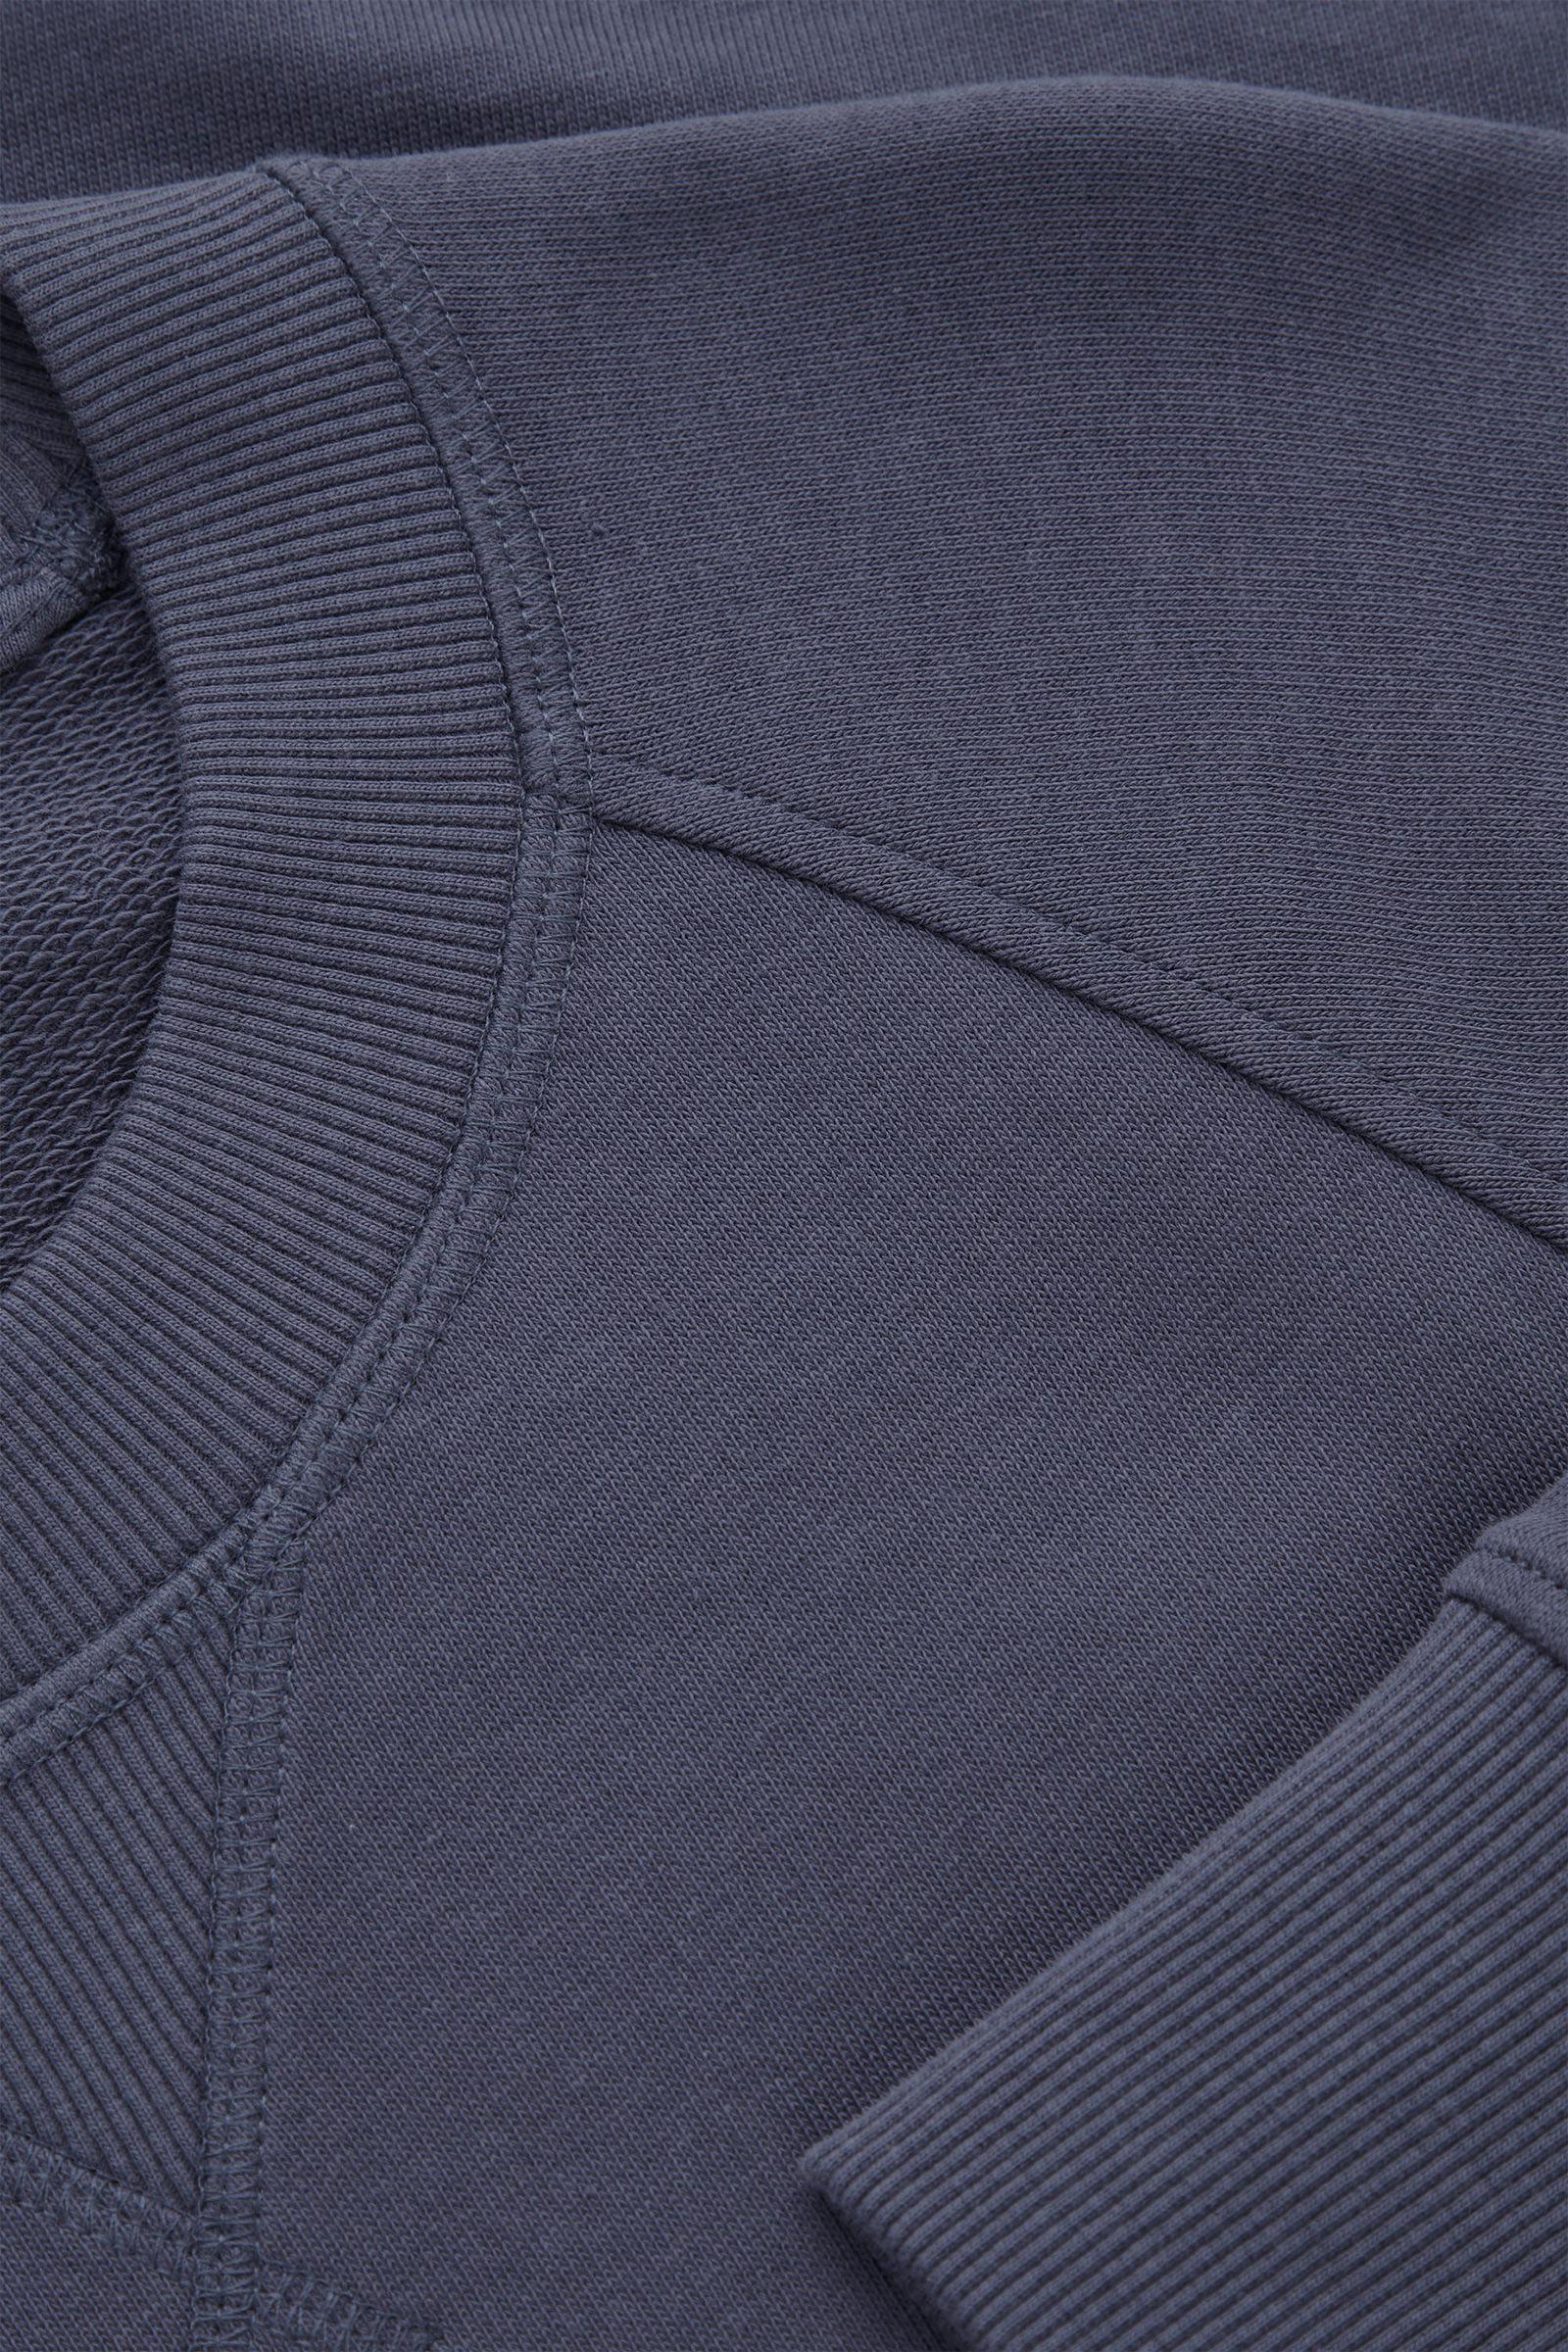 COS 릴랙스드 핏 테리 스웻셔츠의 블루컬러 Detail입니다.